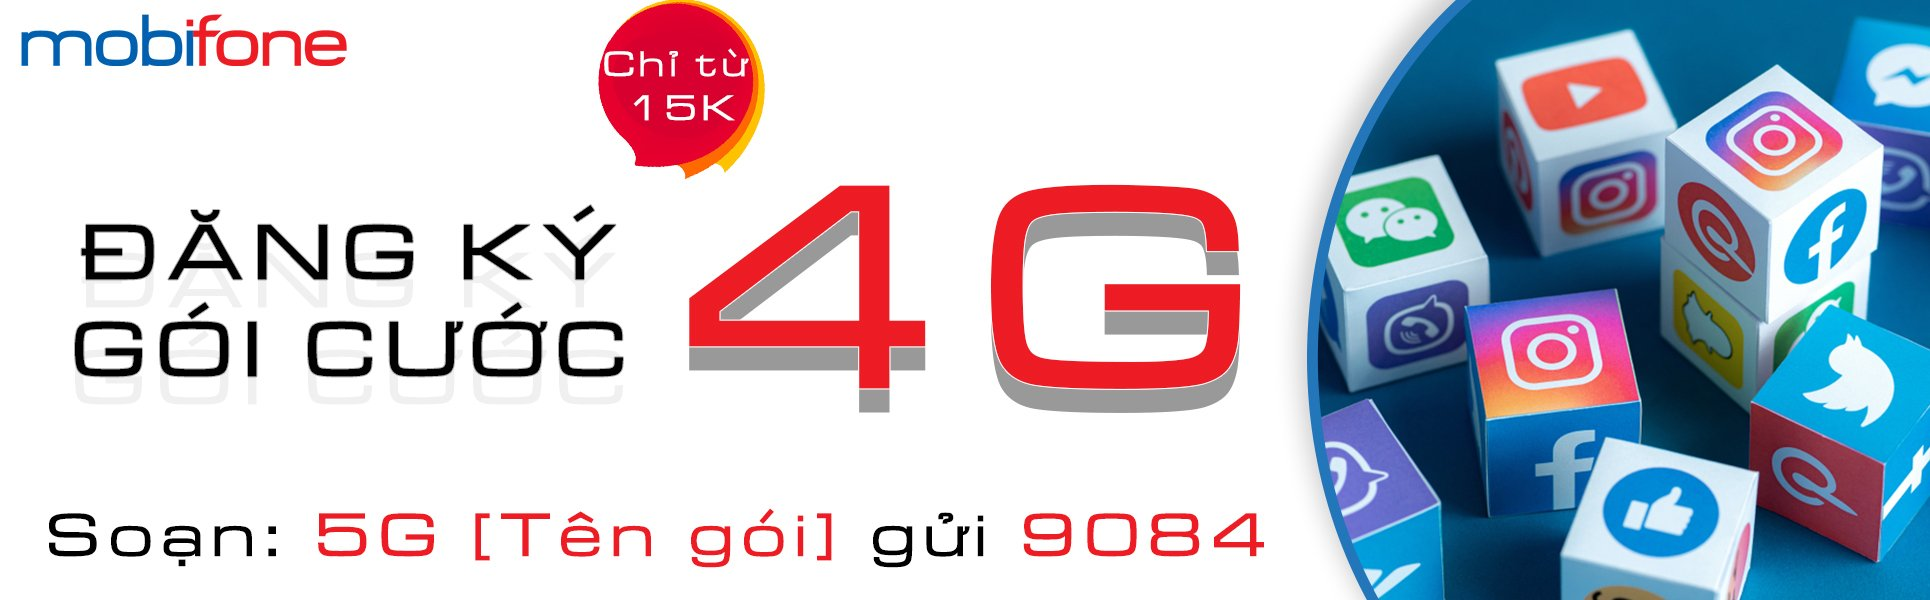 goi-cuoc-3g-mobifone-mobi-di-dong-02